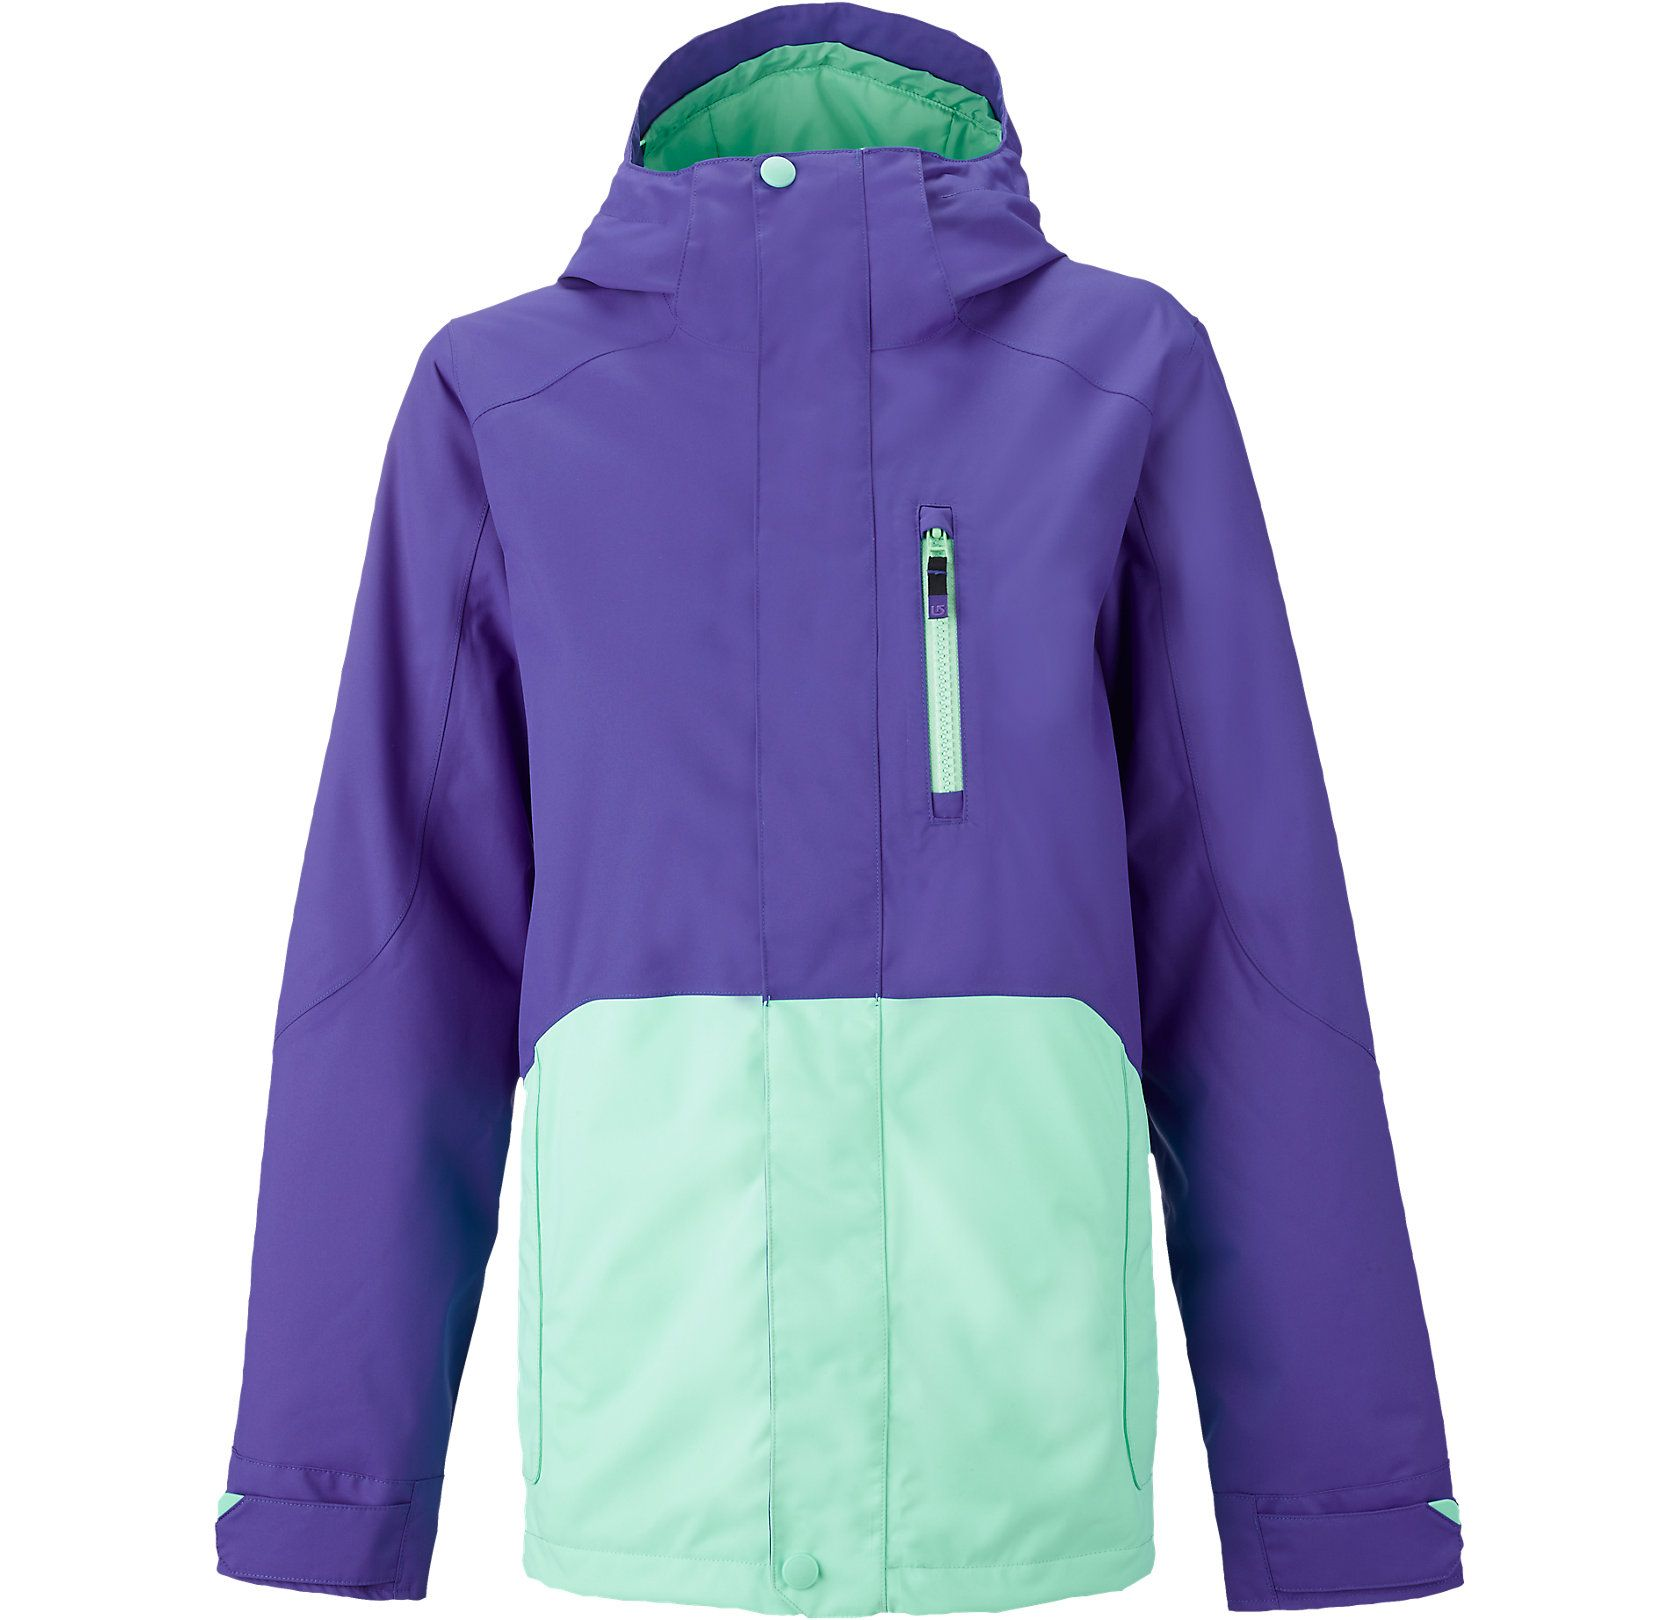 Horizon Snowboard Jacket